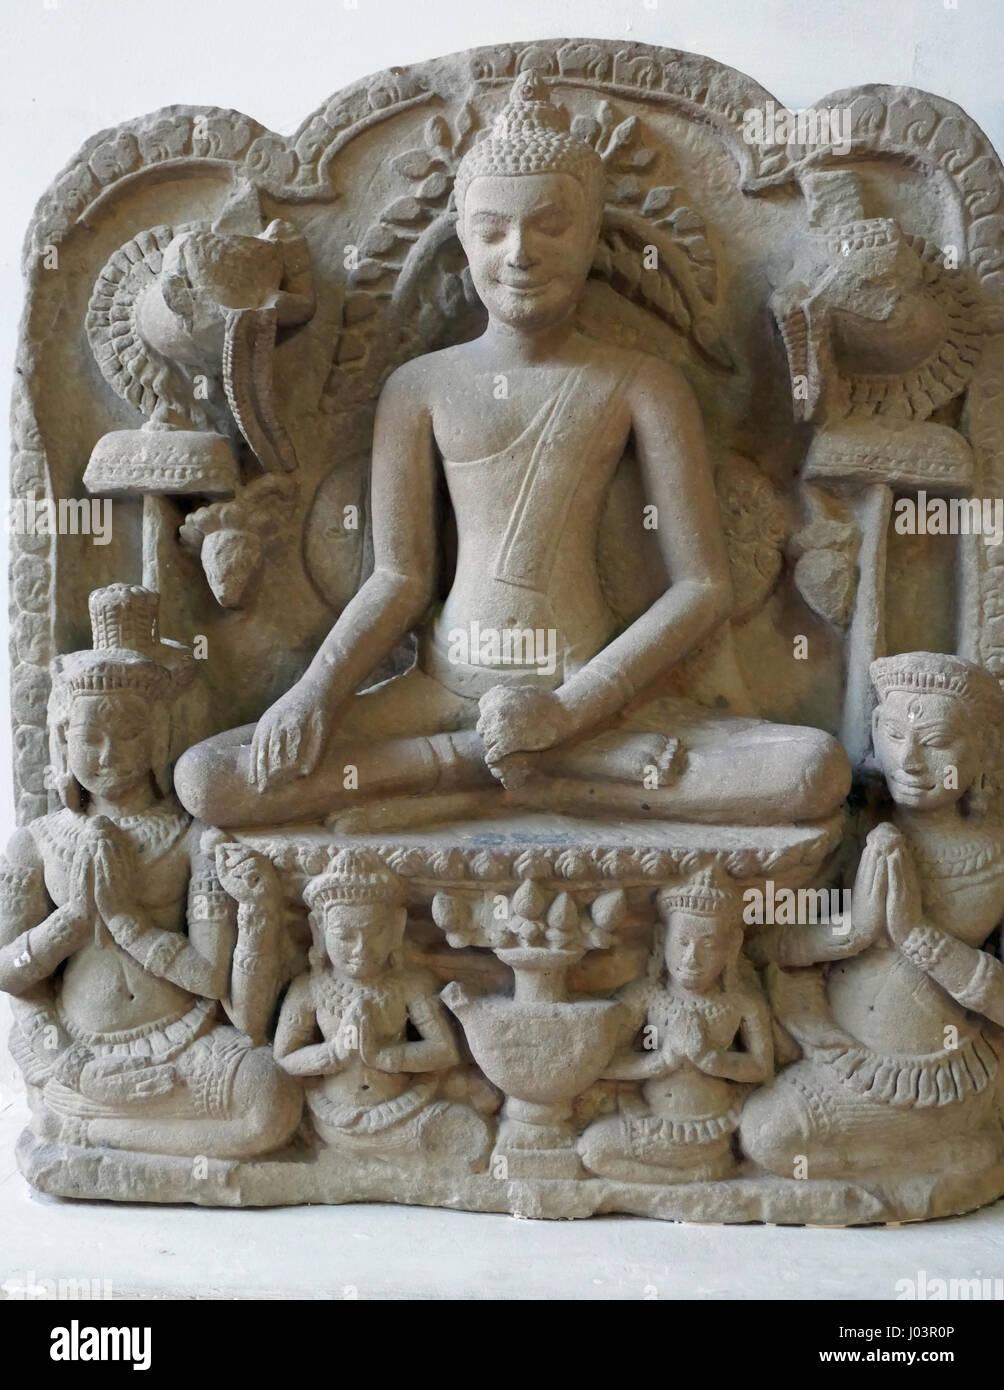 National Museum of Cambodia, Phnom Penh - Stock Image